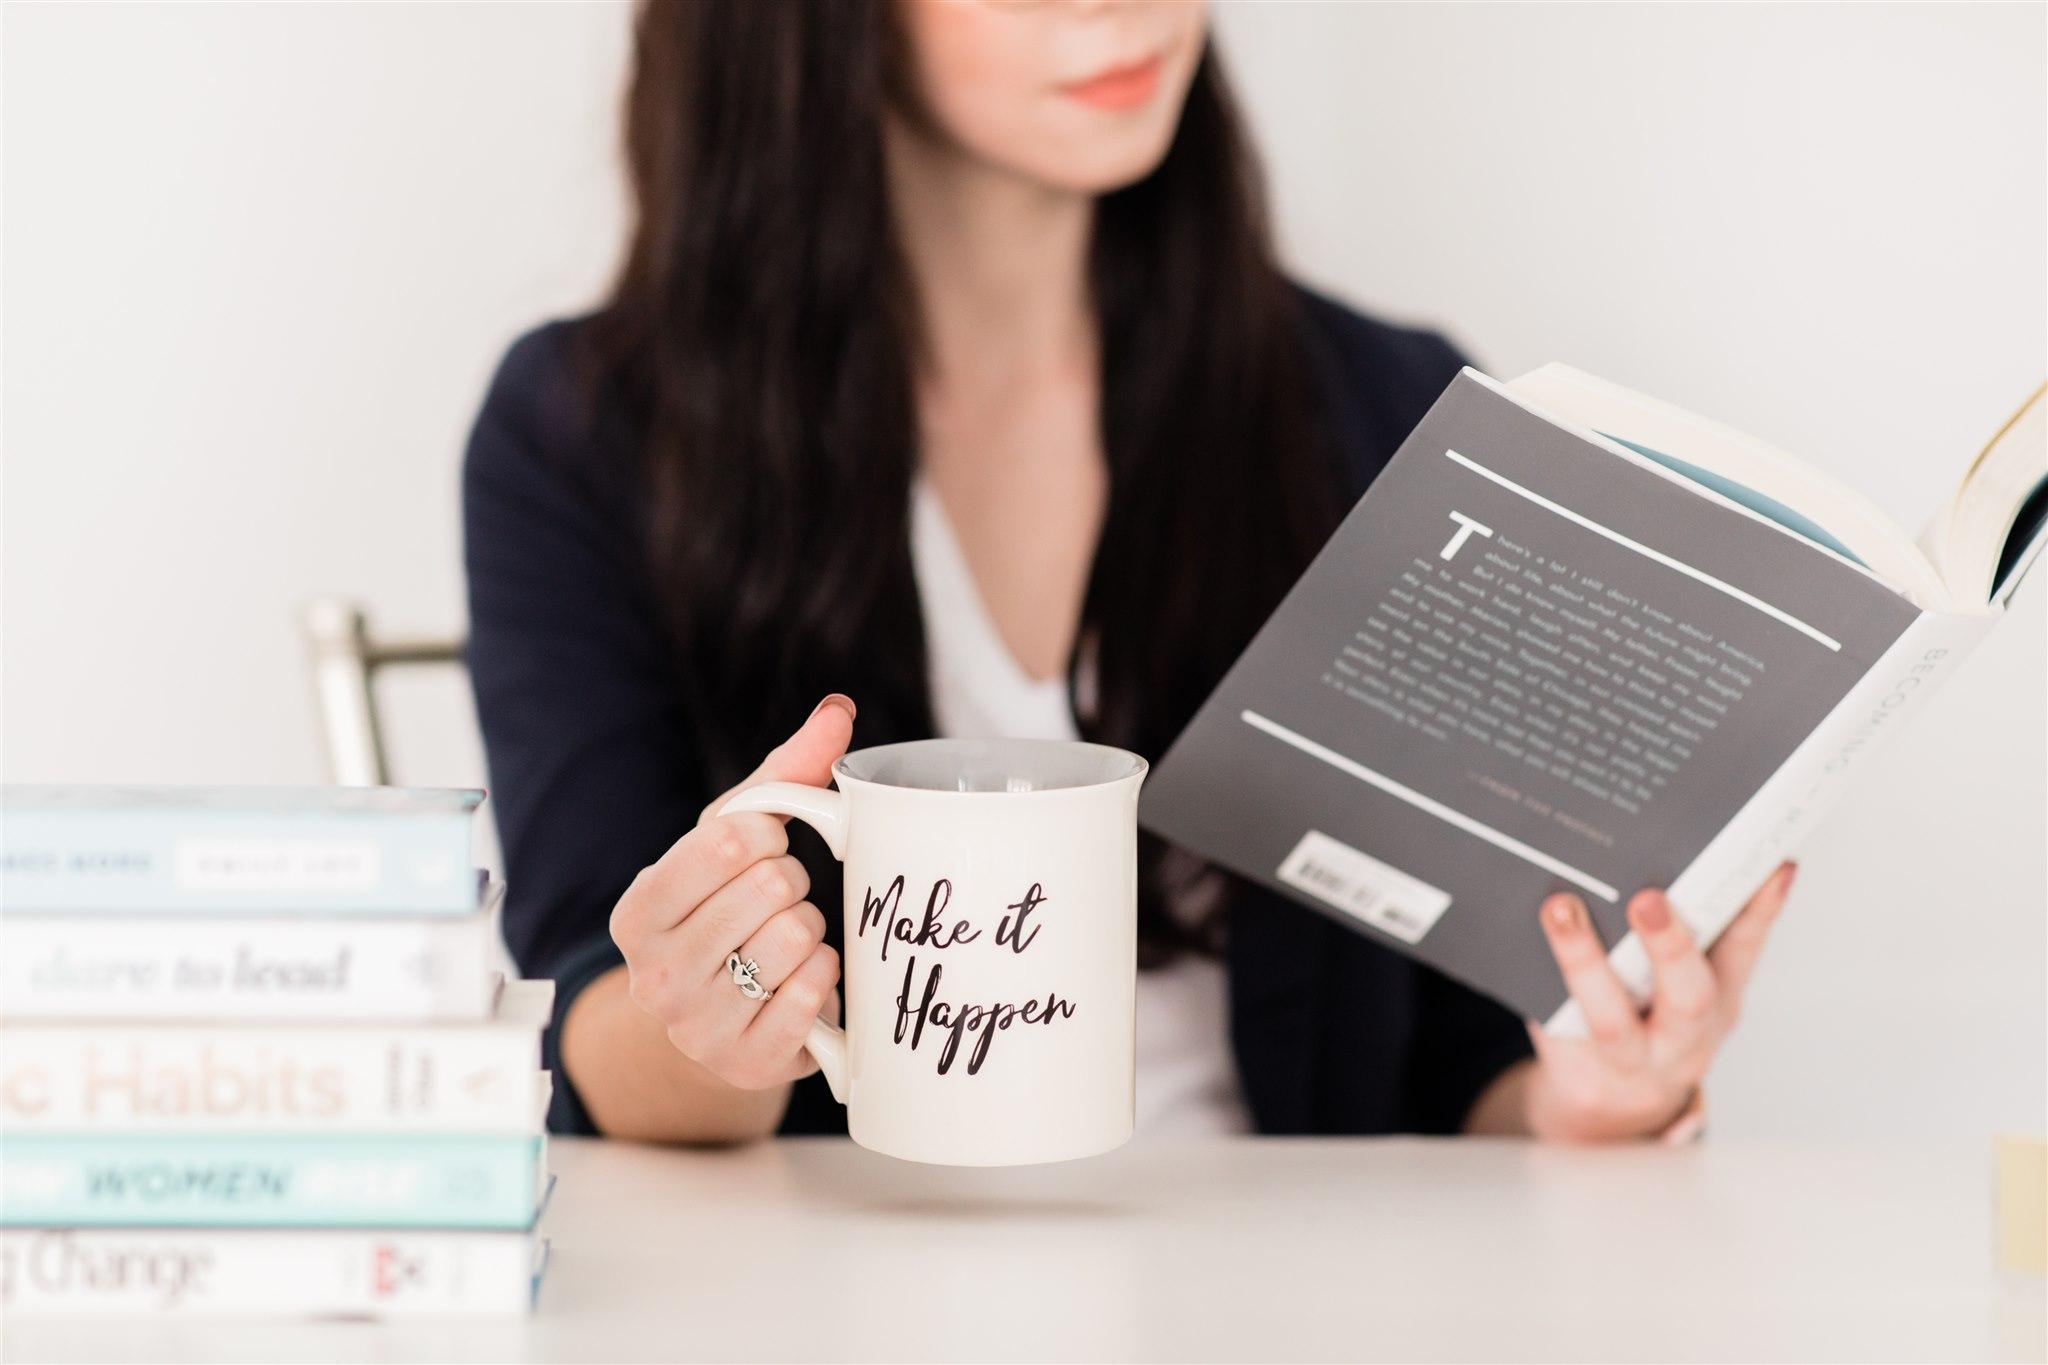 Woman reading and holding mug